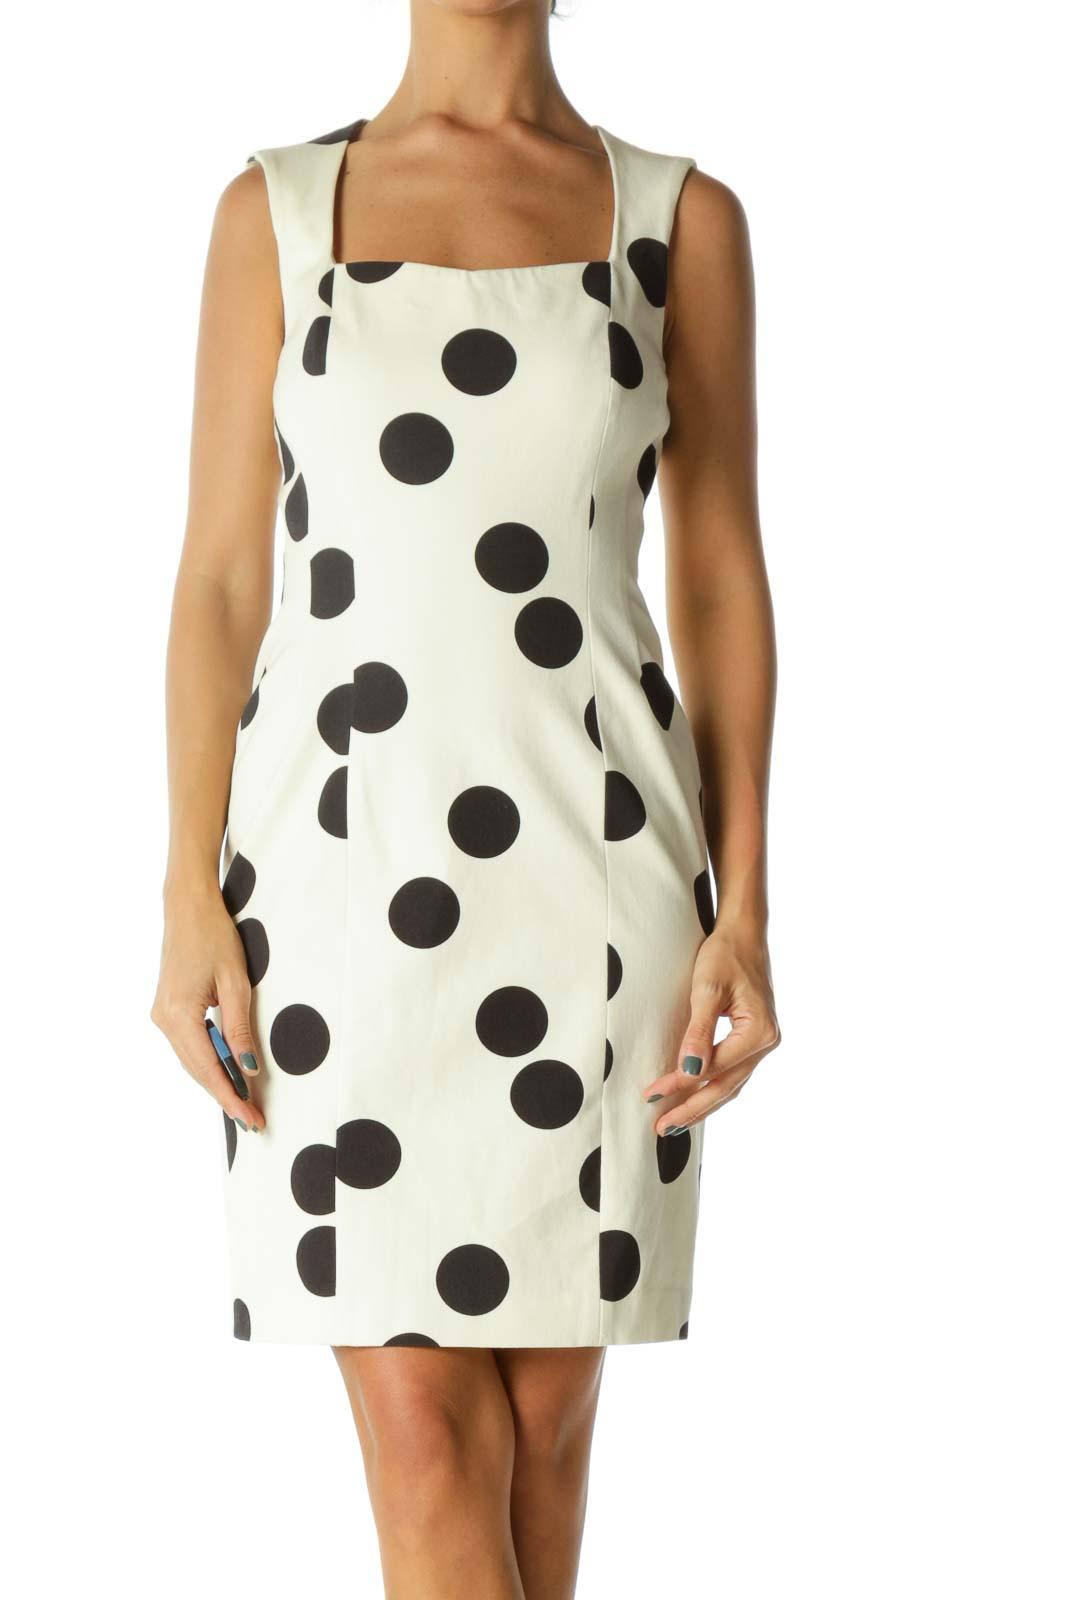 Black & Cream Polka Dot Slim Dress